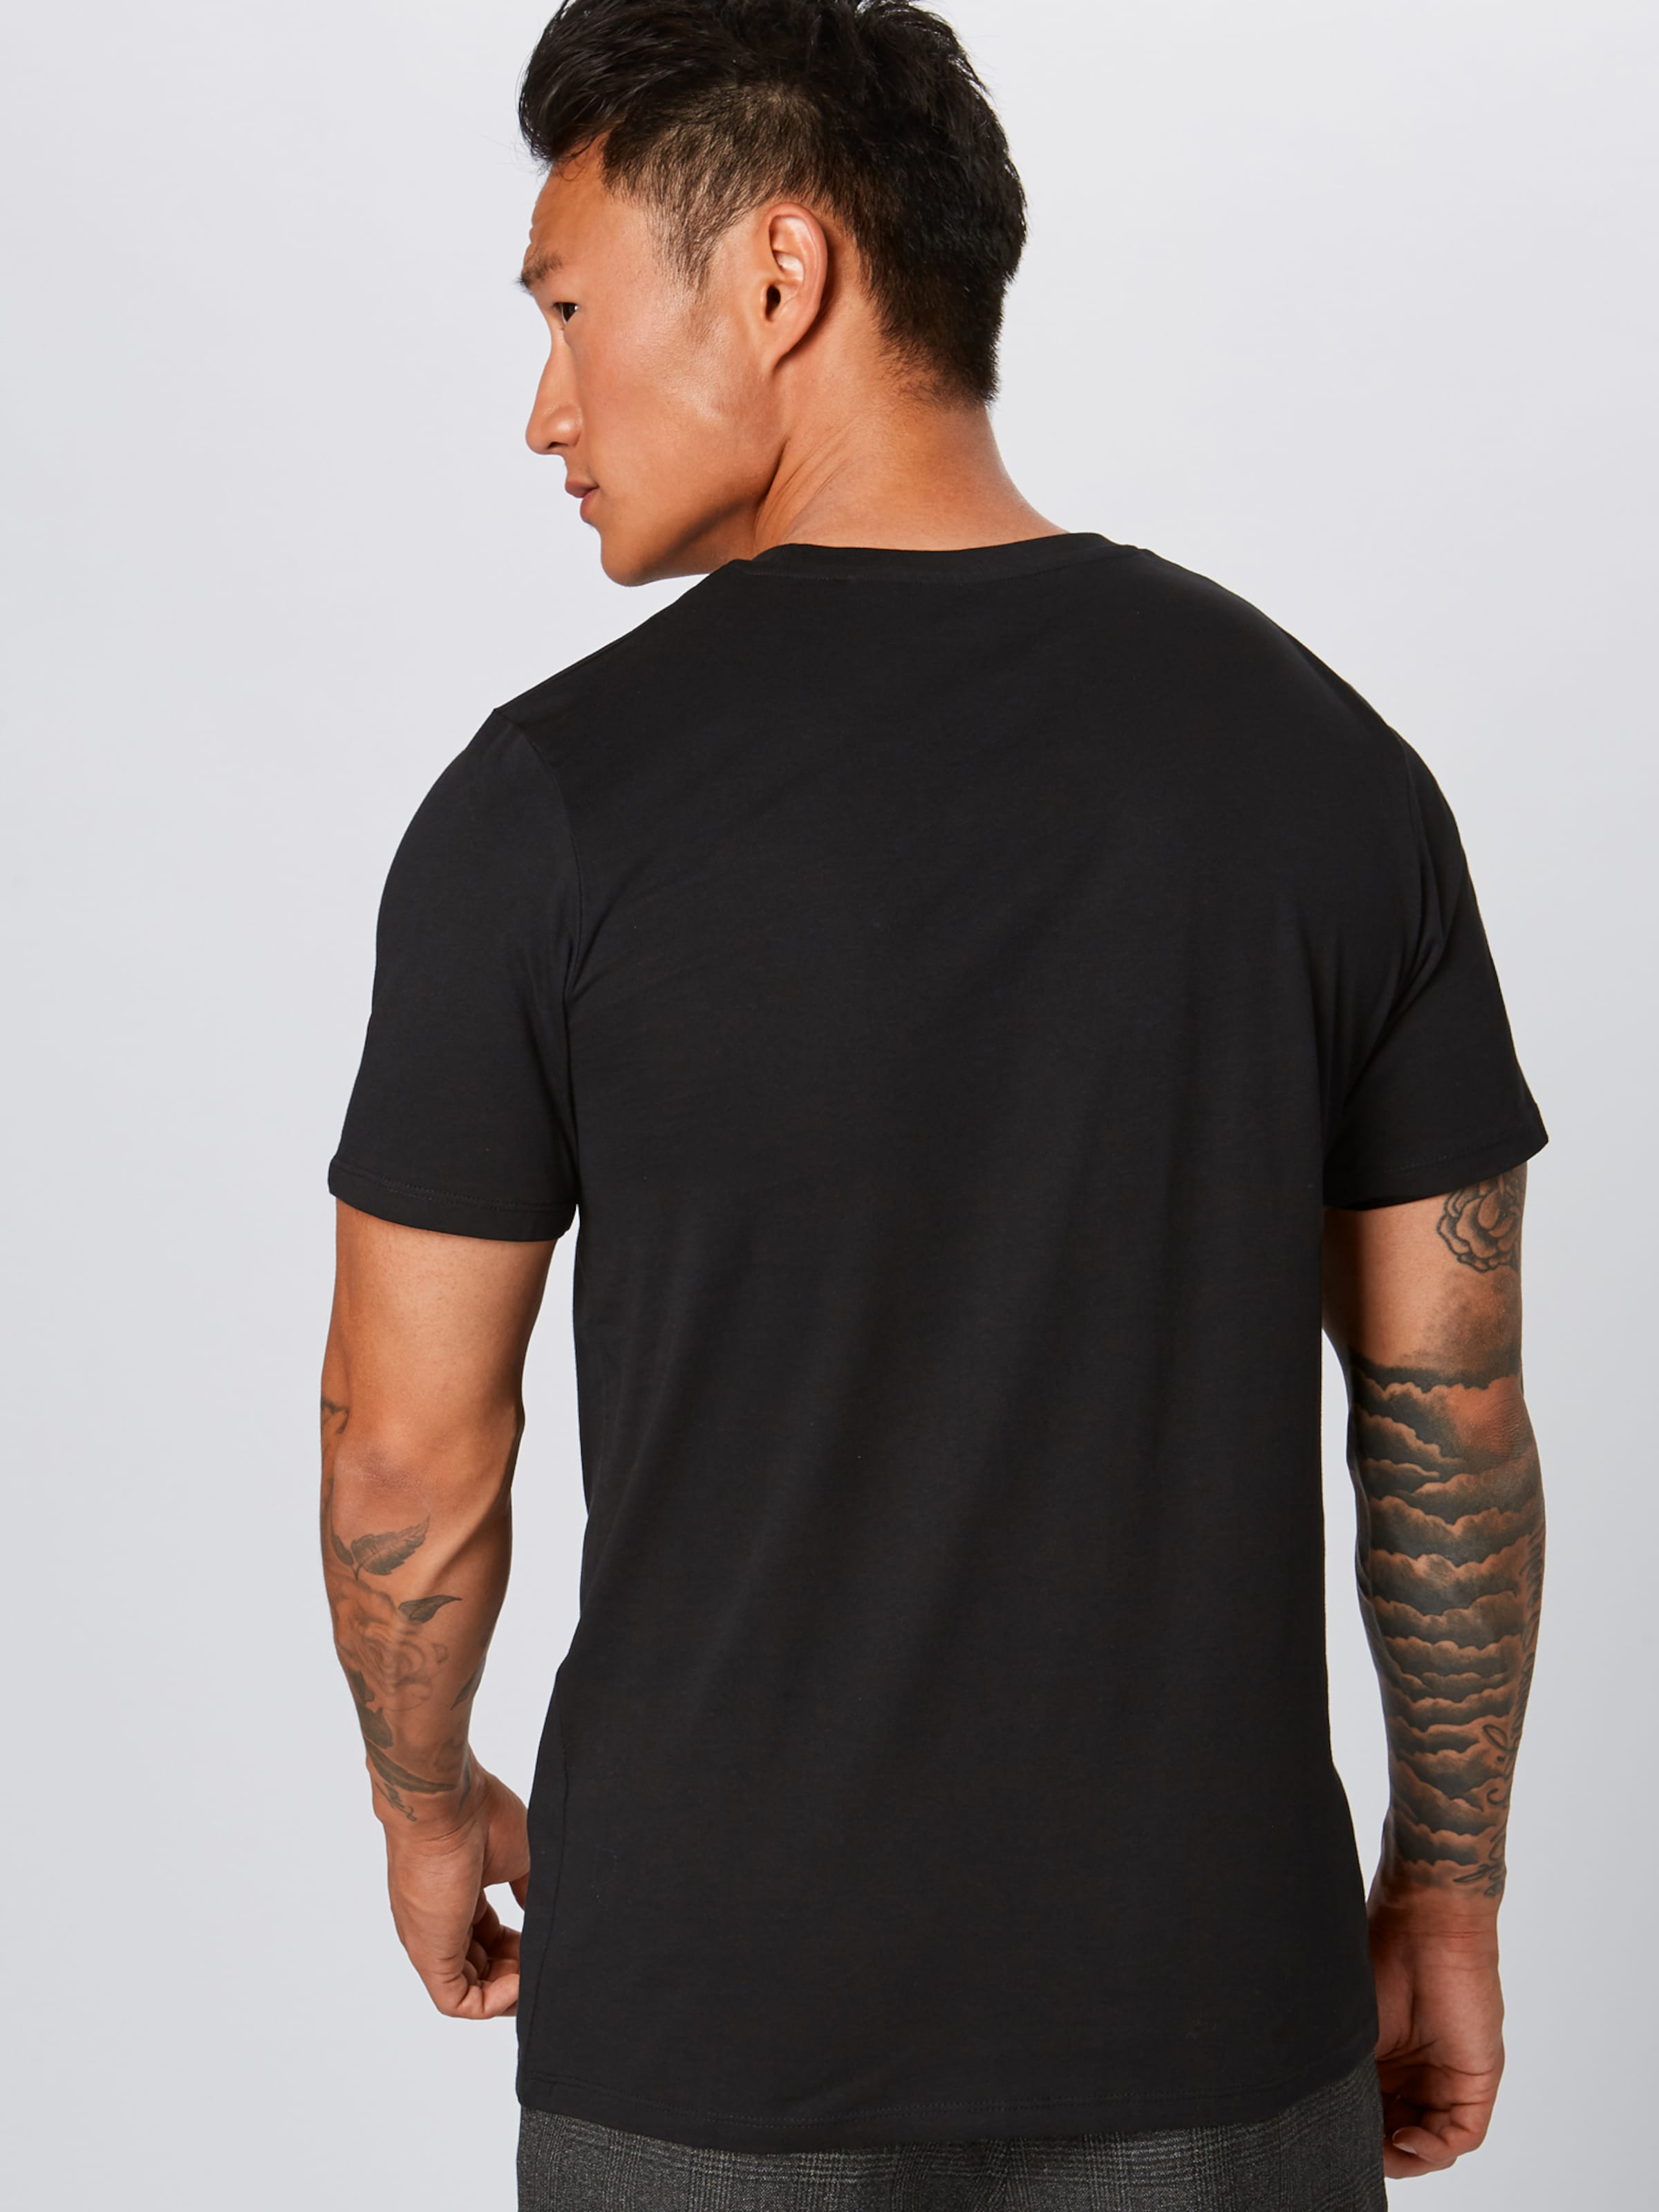 Shirt RotSchwarz In Weiß Jackamp; Jones 8NwymOvn0